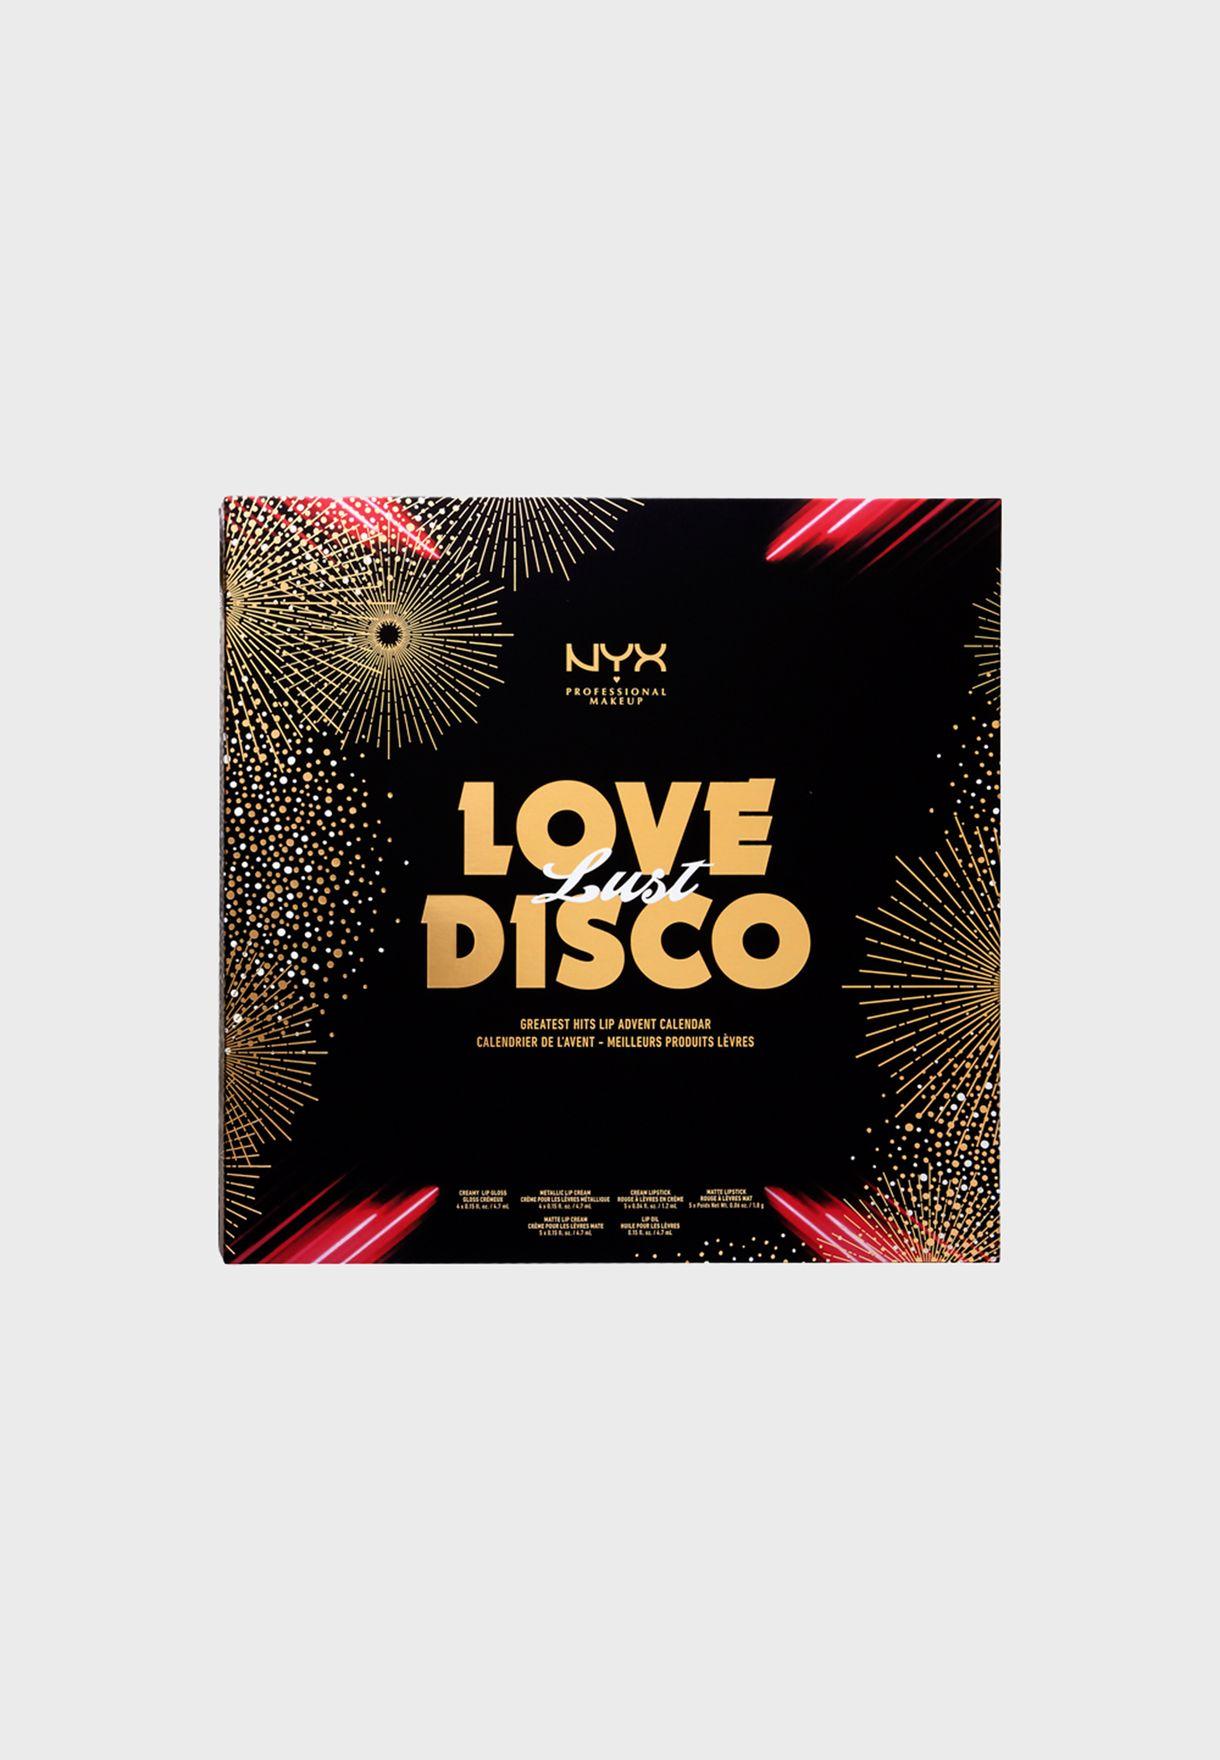 Love Lust Disco Greatest Hits Lip Advent Calendar